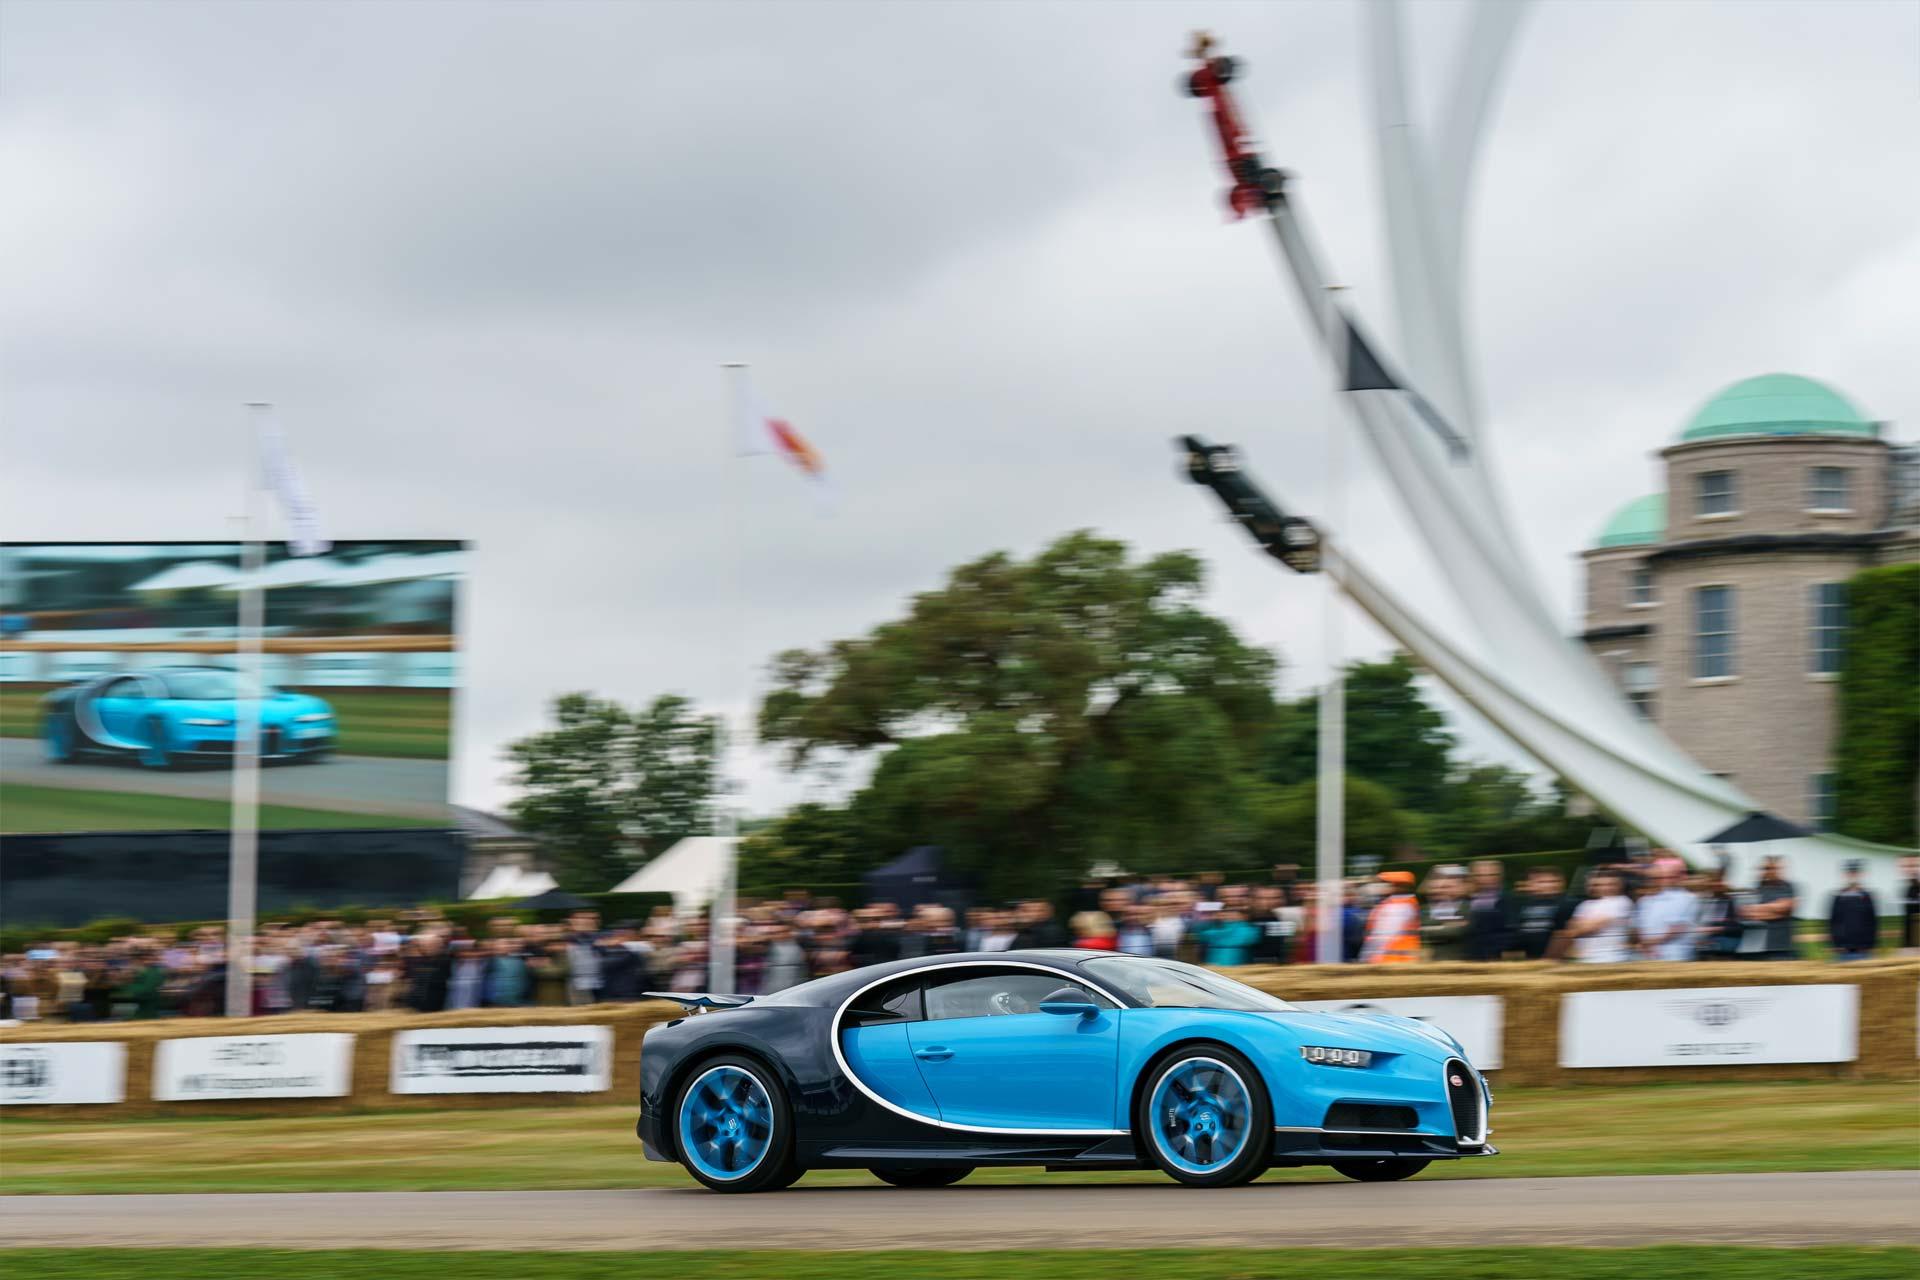 Bugatti-at-Goodwood-2017-5